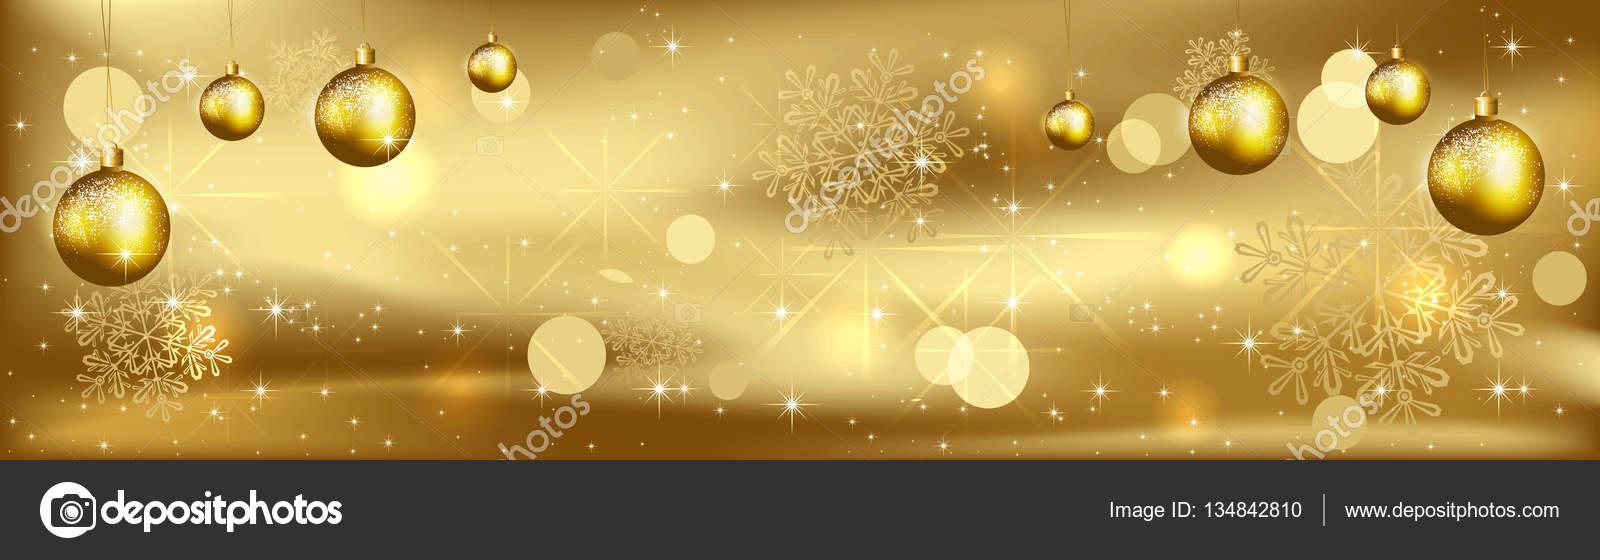 Download 81 Background Banner Natal Paling Keren